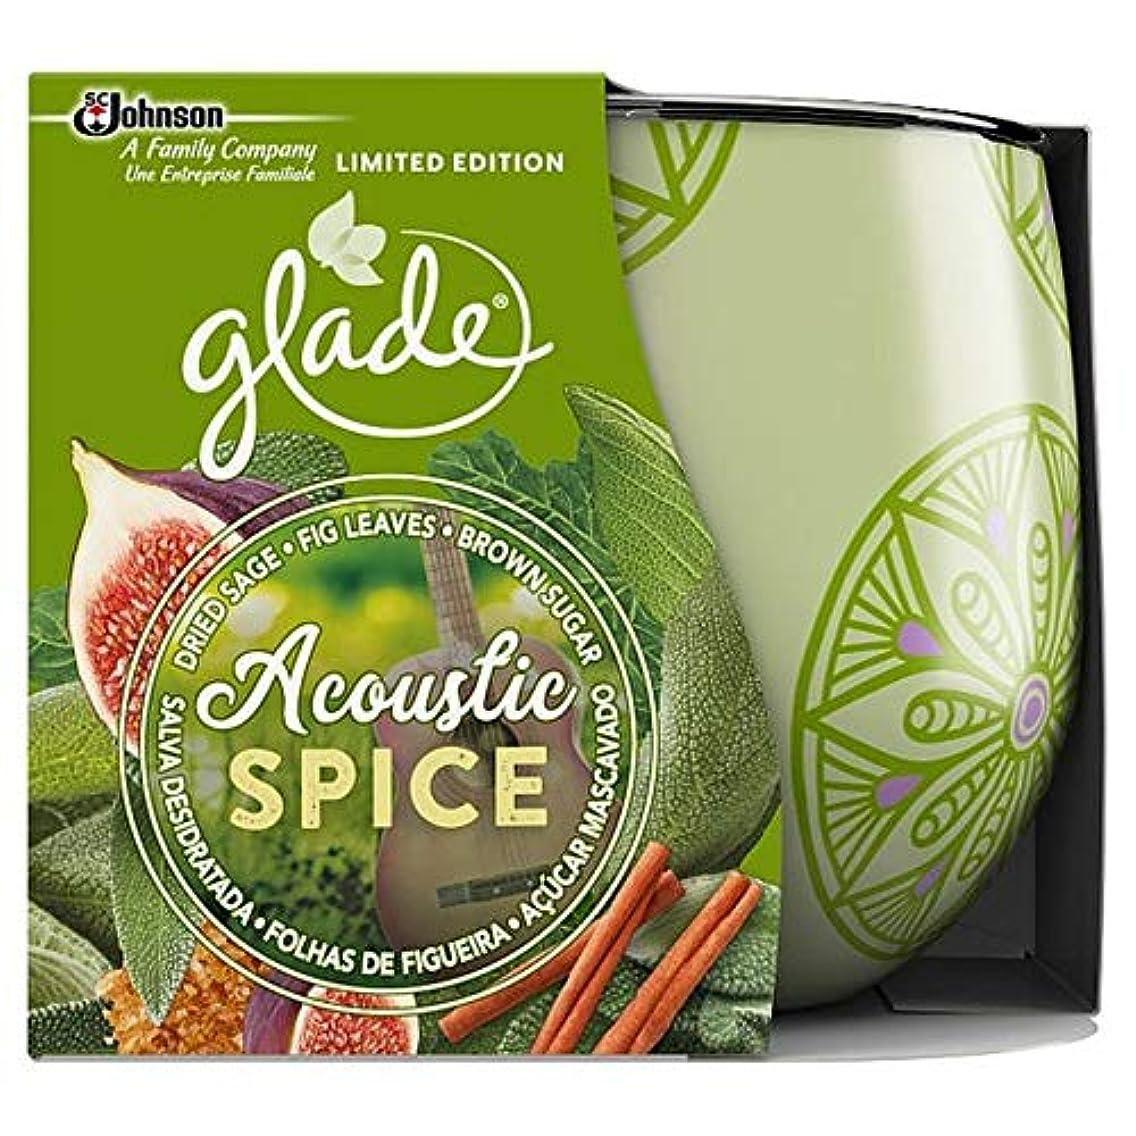 [Glade ] 音響スパイスキャンドル120グラムを空き地 - Glade Acoustic Spice Candle 120G [並行輸入品]